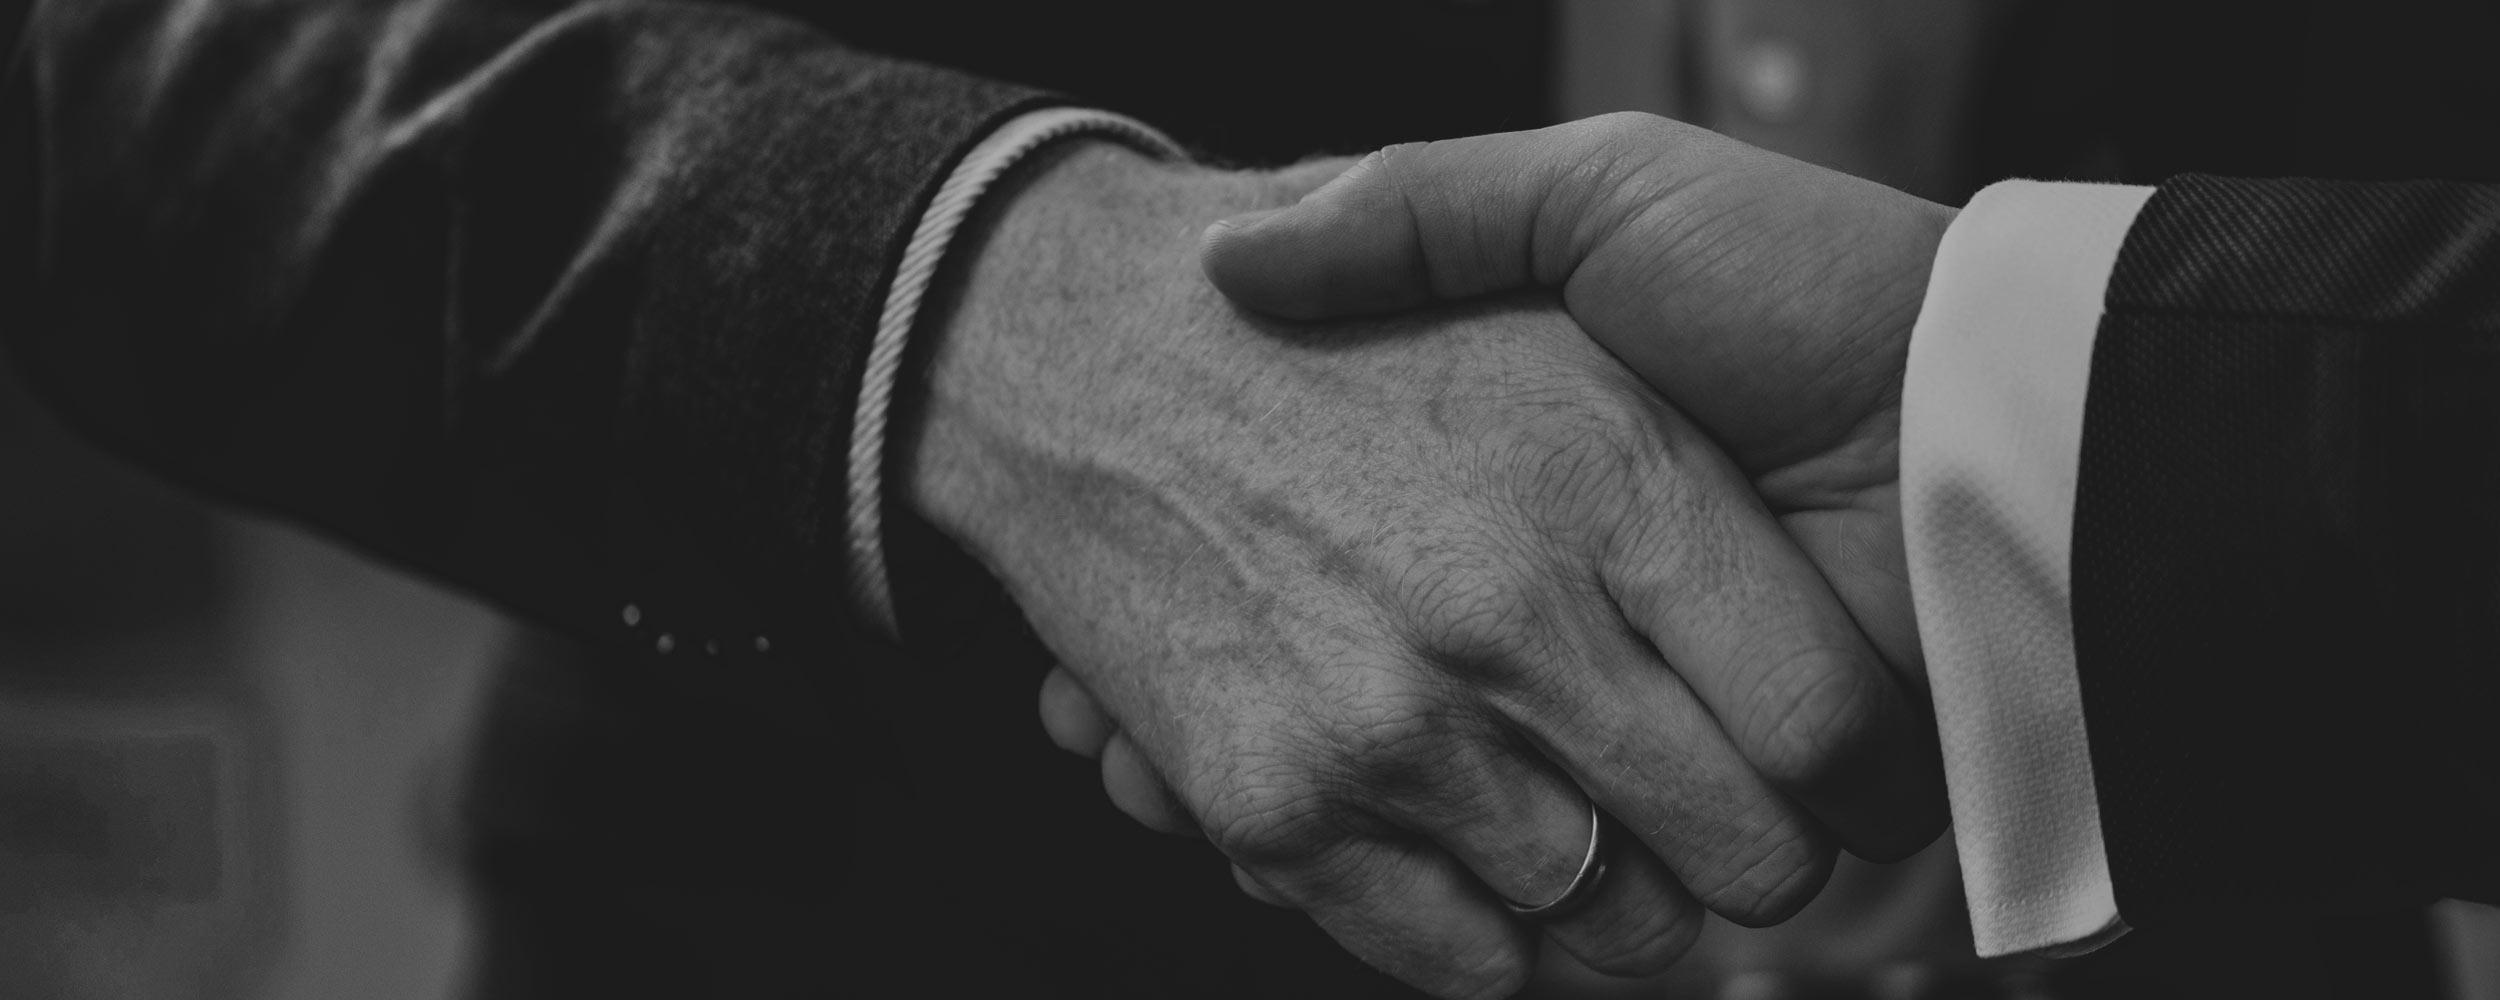 NEXIS 4 |Partner | Handschlag